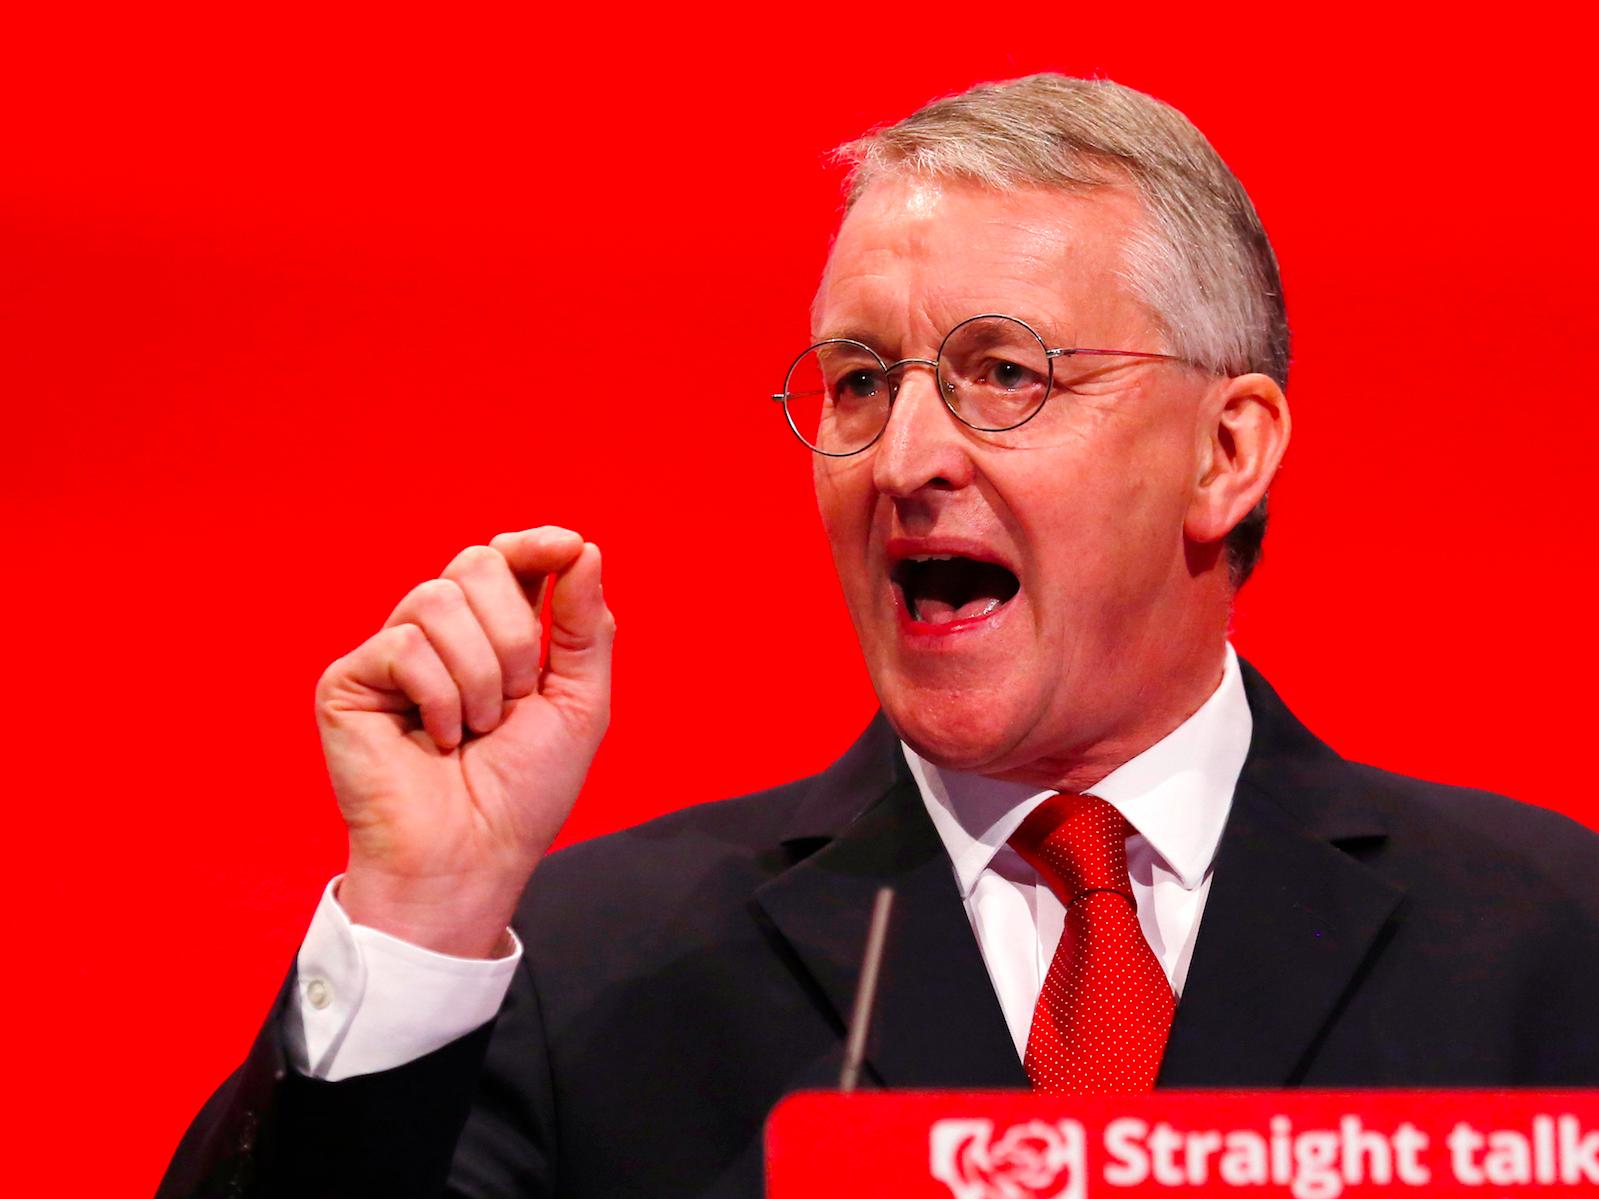 jeremy-corbyn-has-fired-shadow-foreign-secretary-hilary-benn.jpg.png